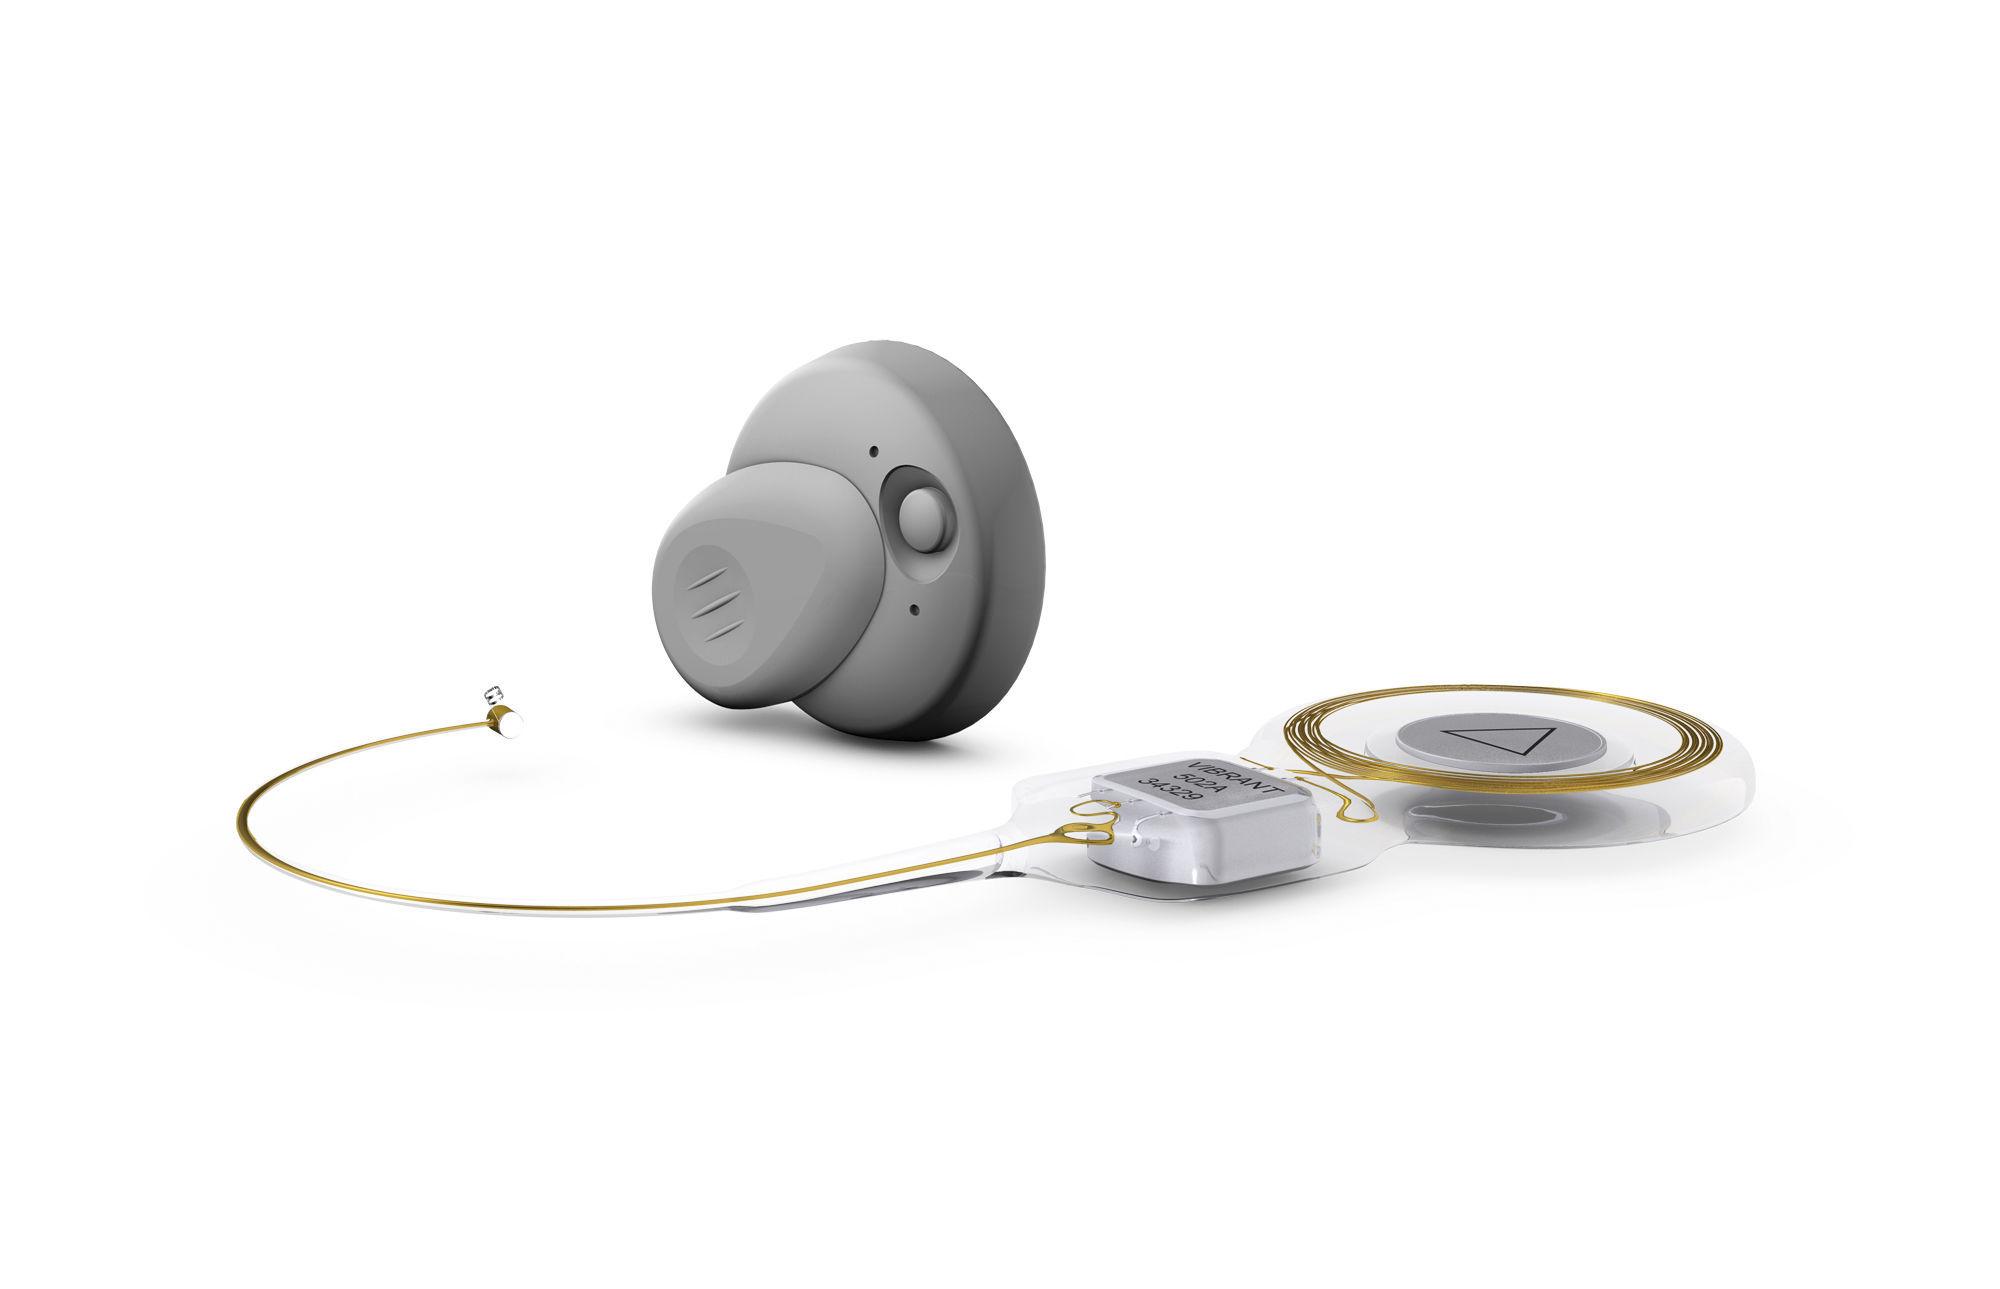 internal-part-middle-ear-implant-body-worn-processor-70814-8529735.jpg